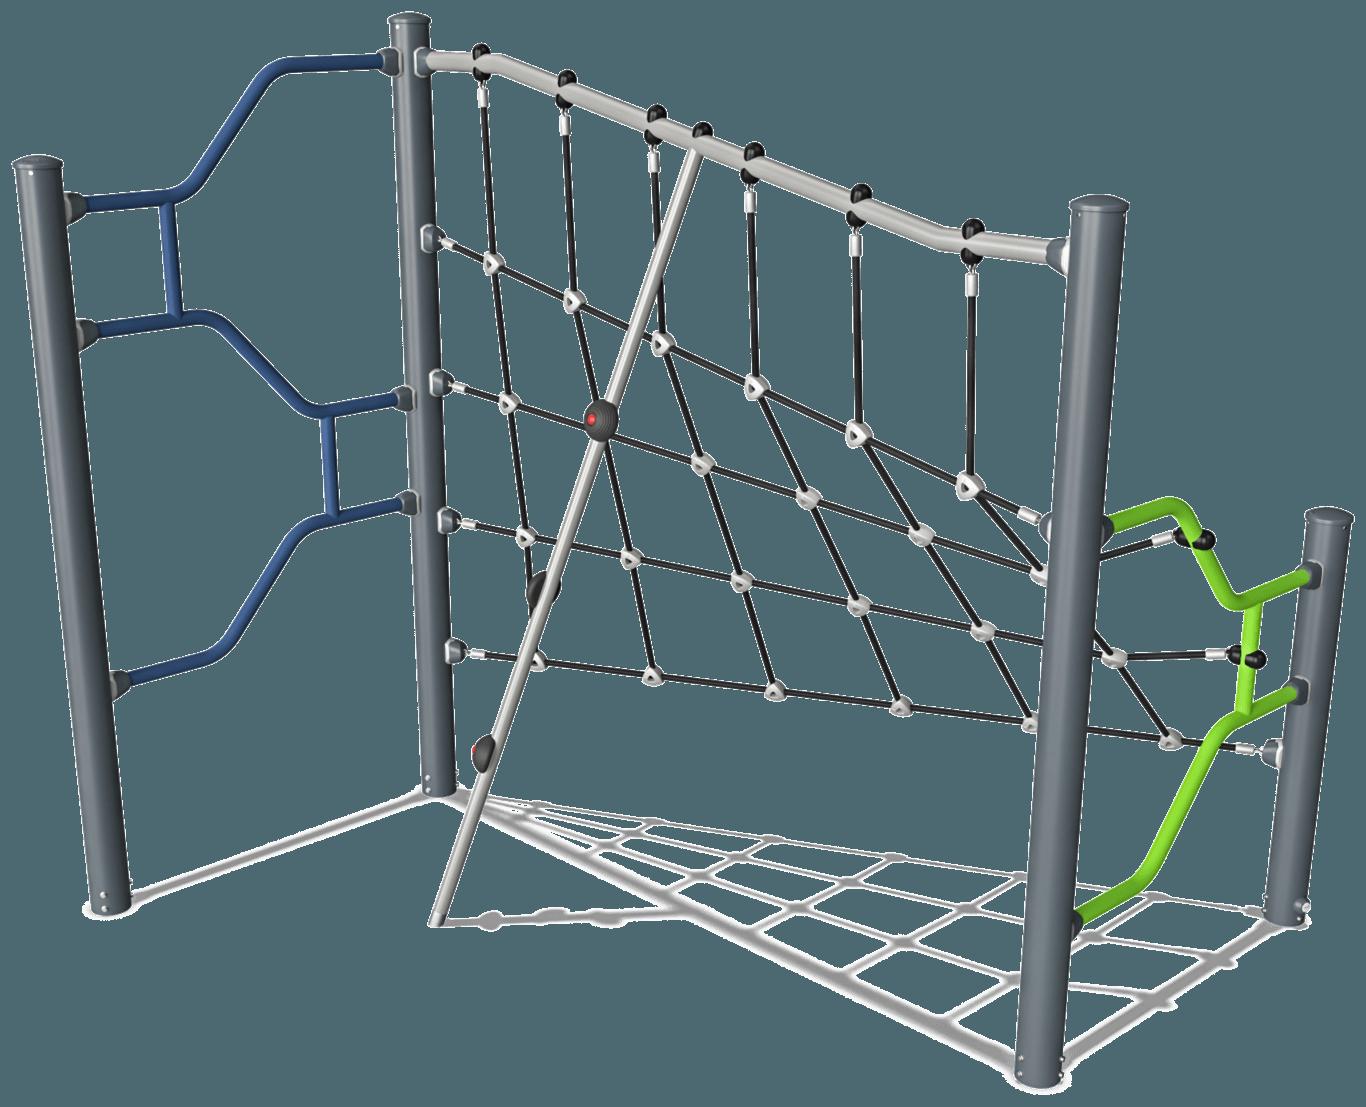 PCX803_CAD1_US-1366